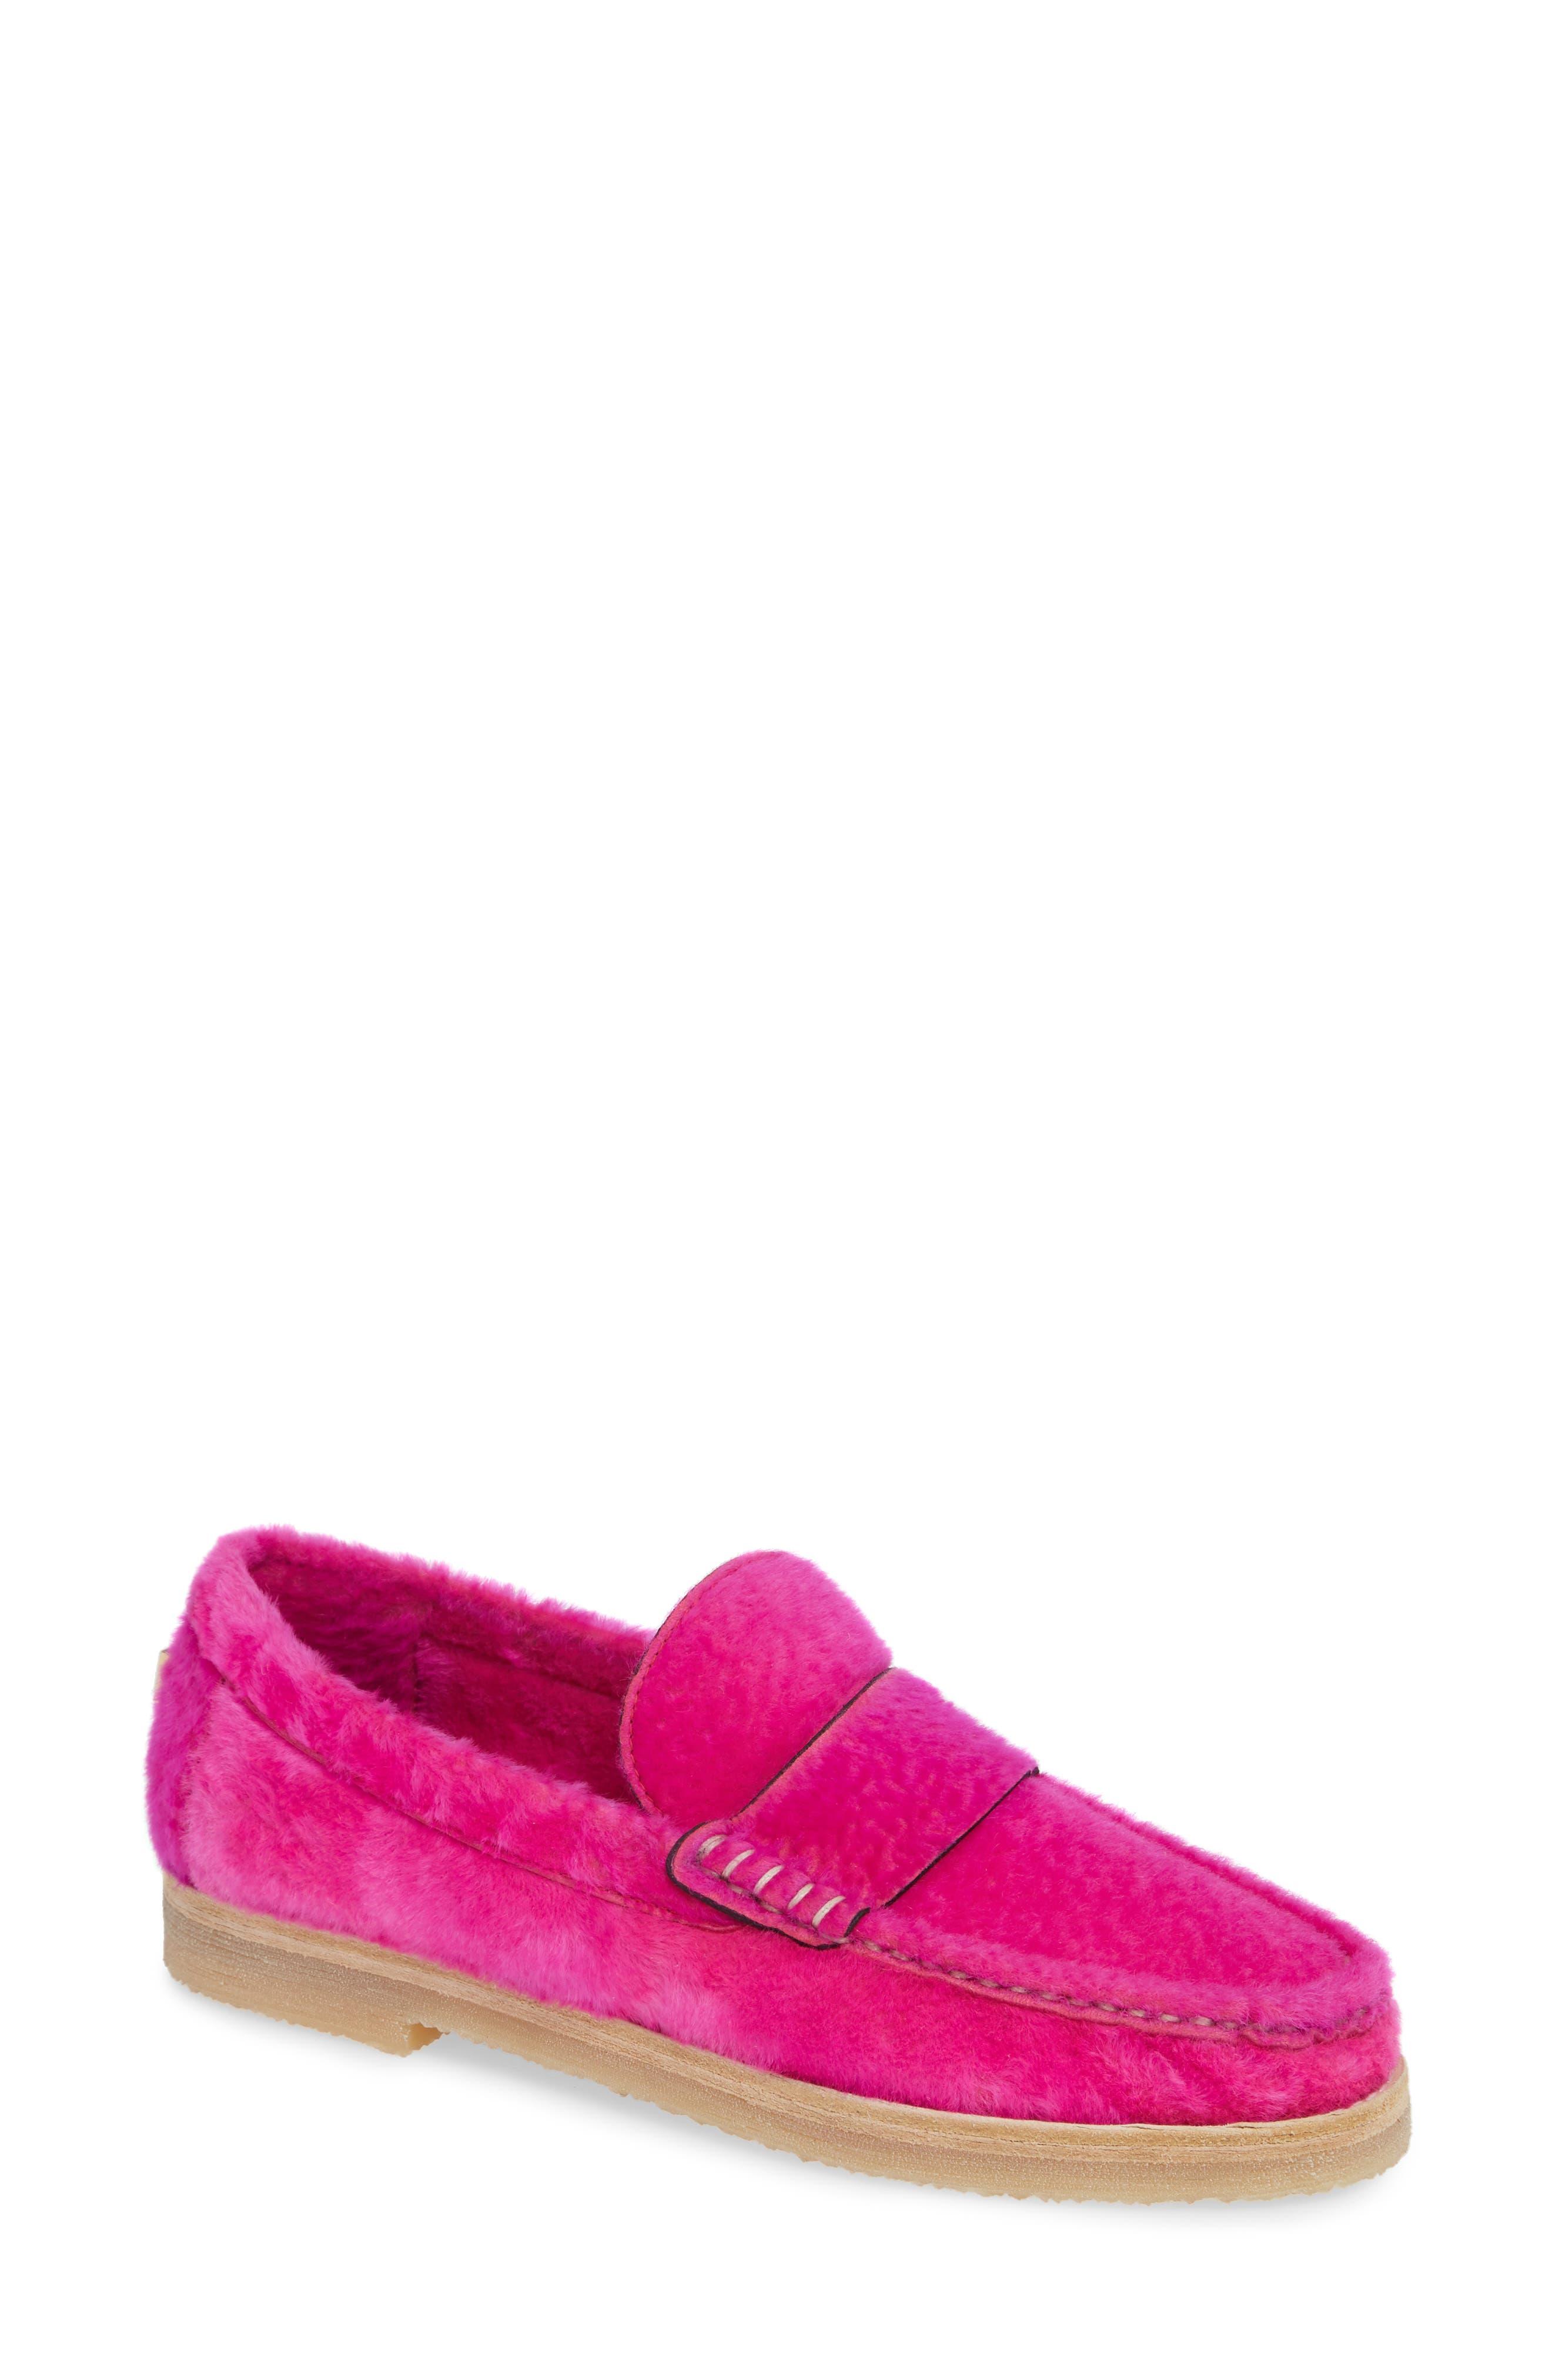 Stuart Weitzman Bromley Genuine Shearling Loafer, Pink